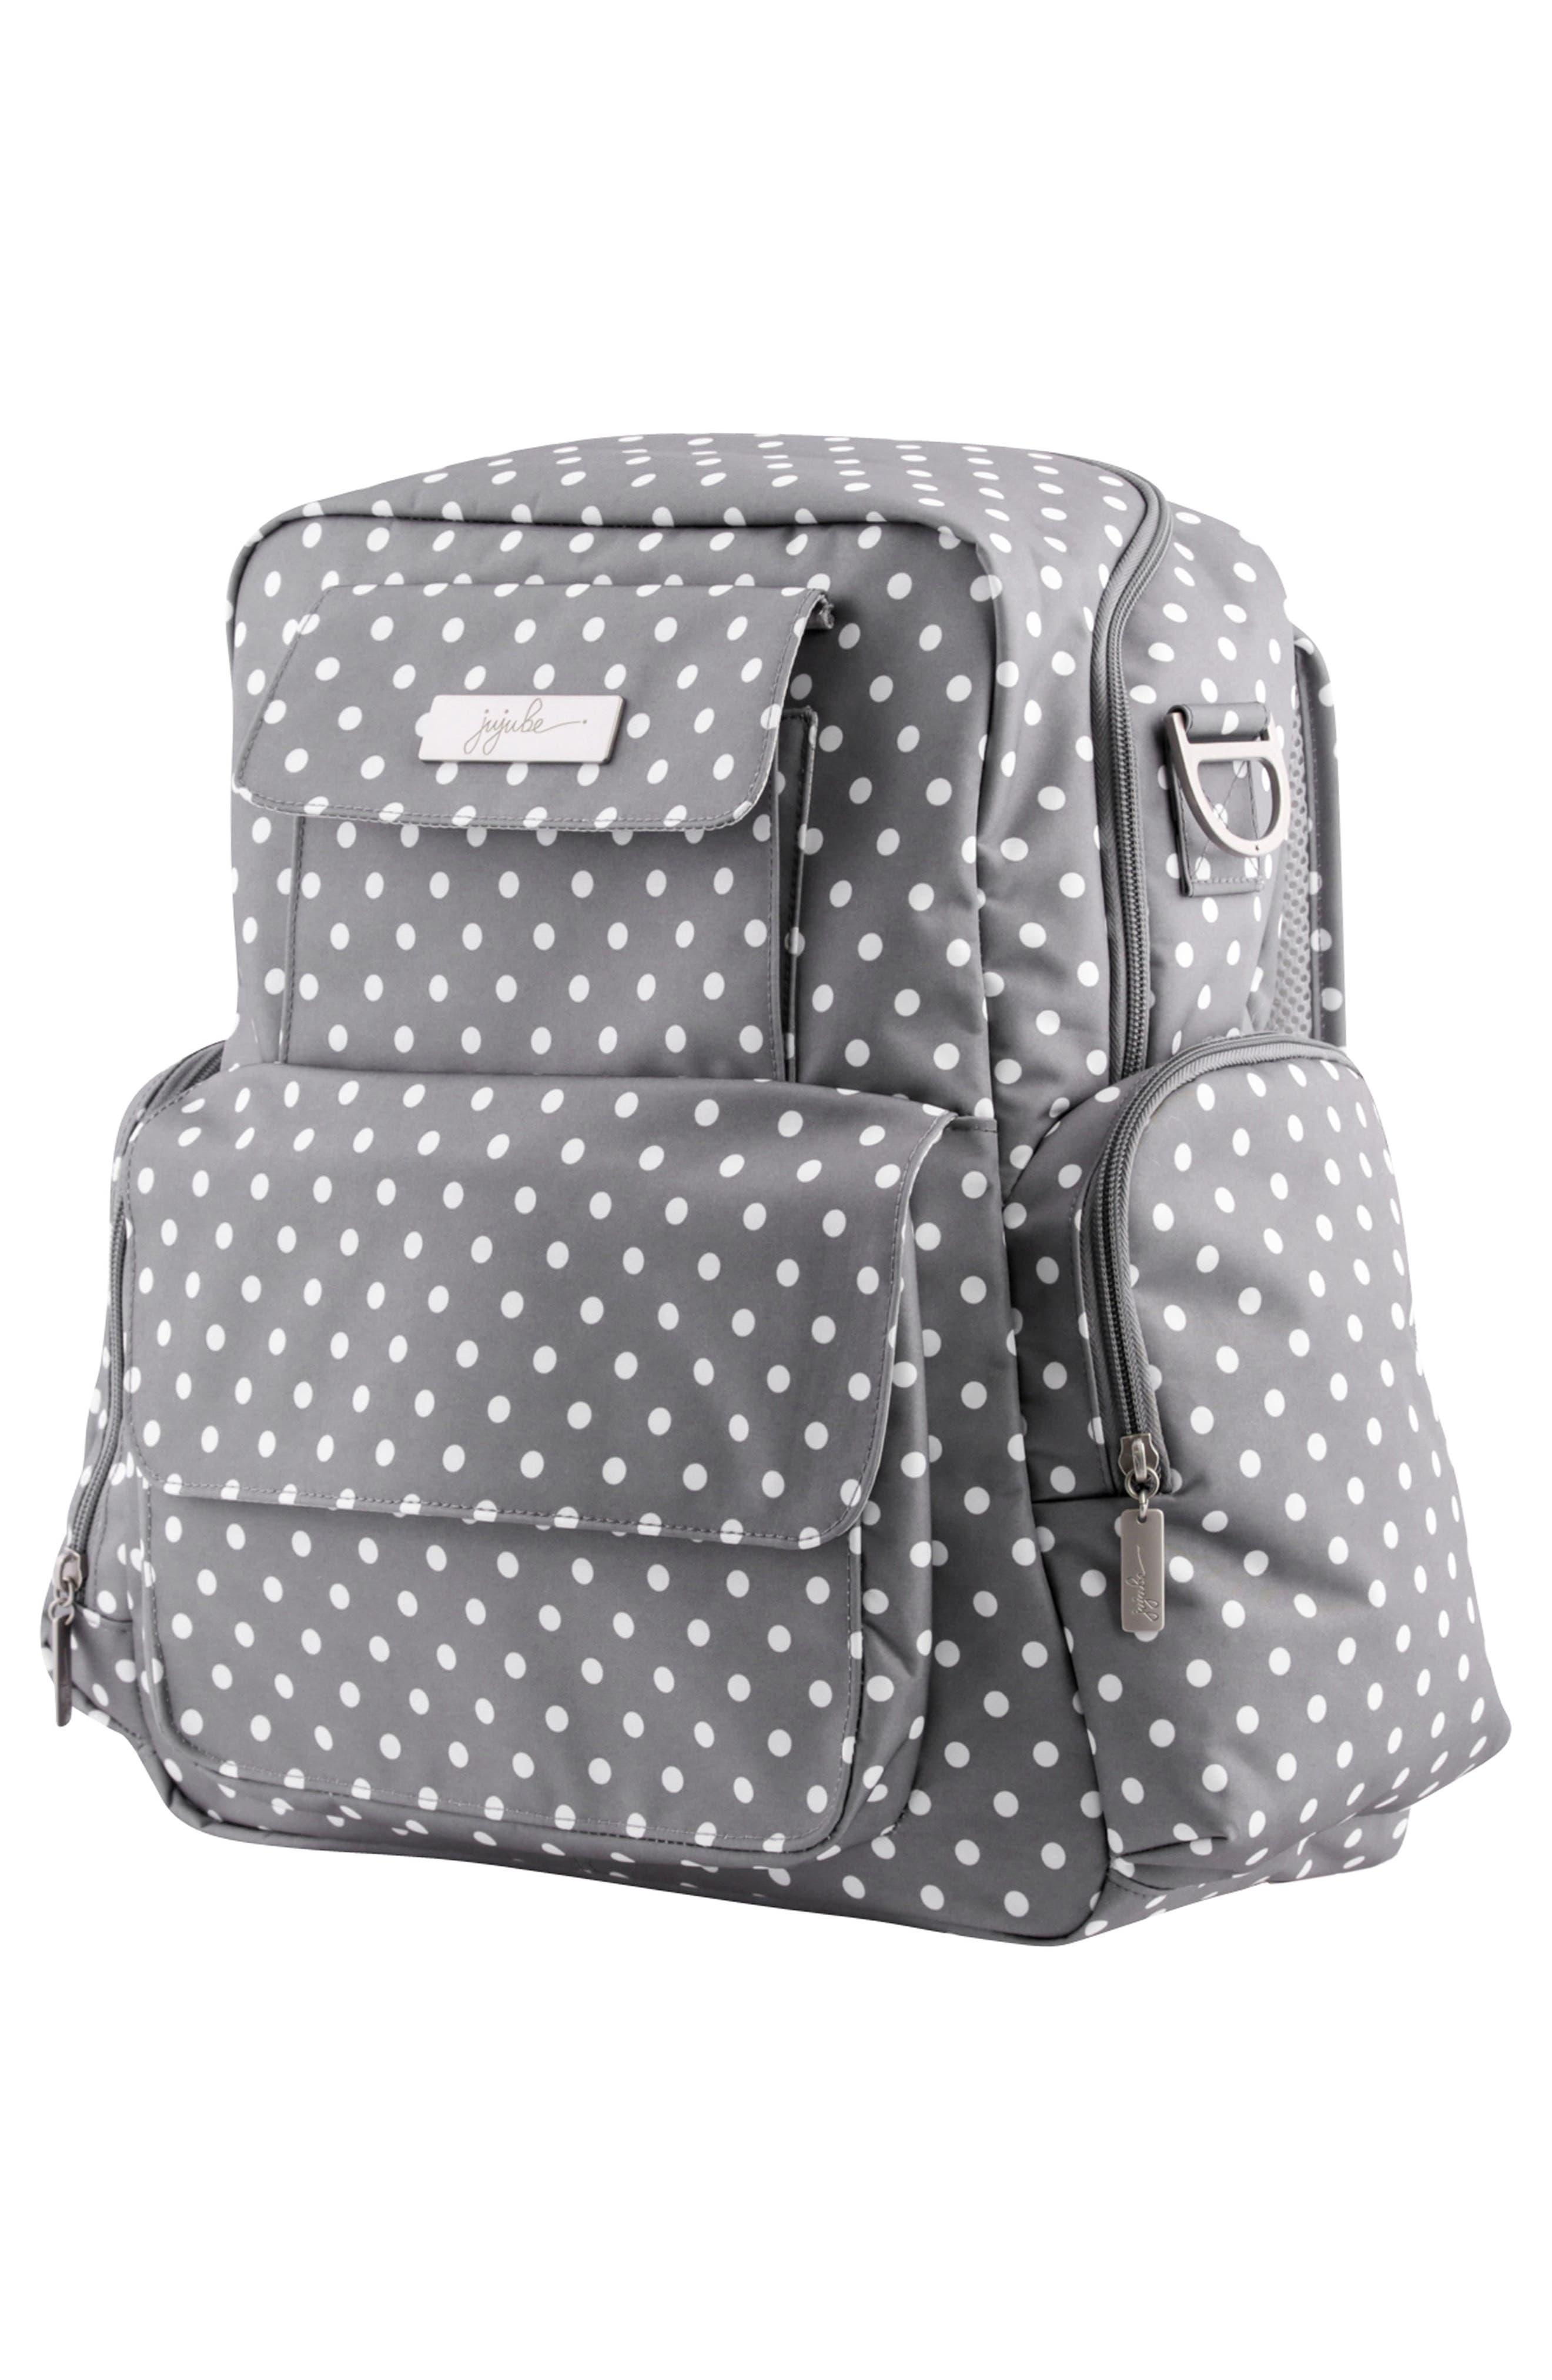 Be Nurtured Pumping Backpack,                             Alternate thumbnail 7, color,                             020